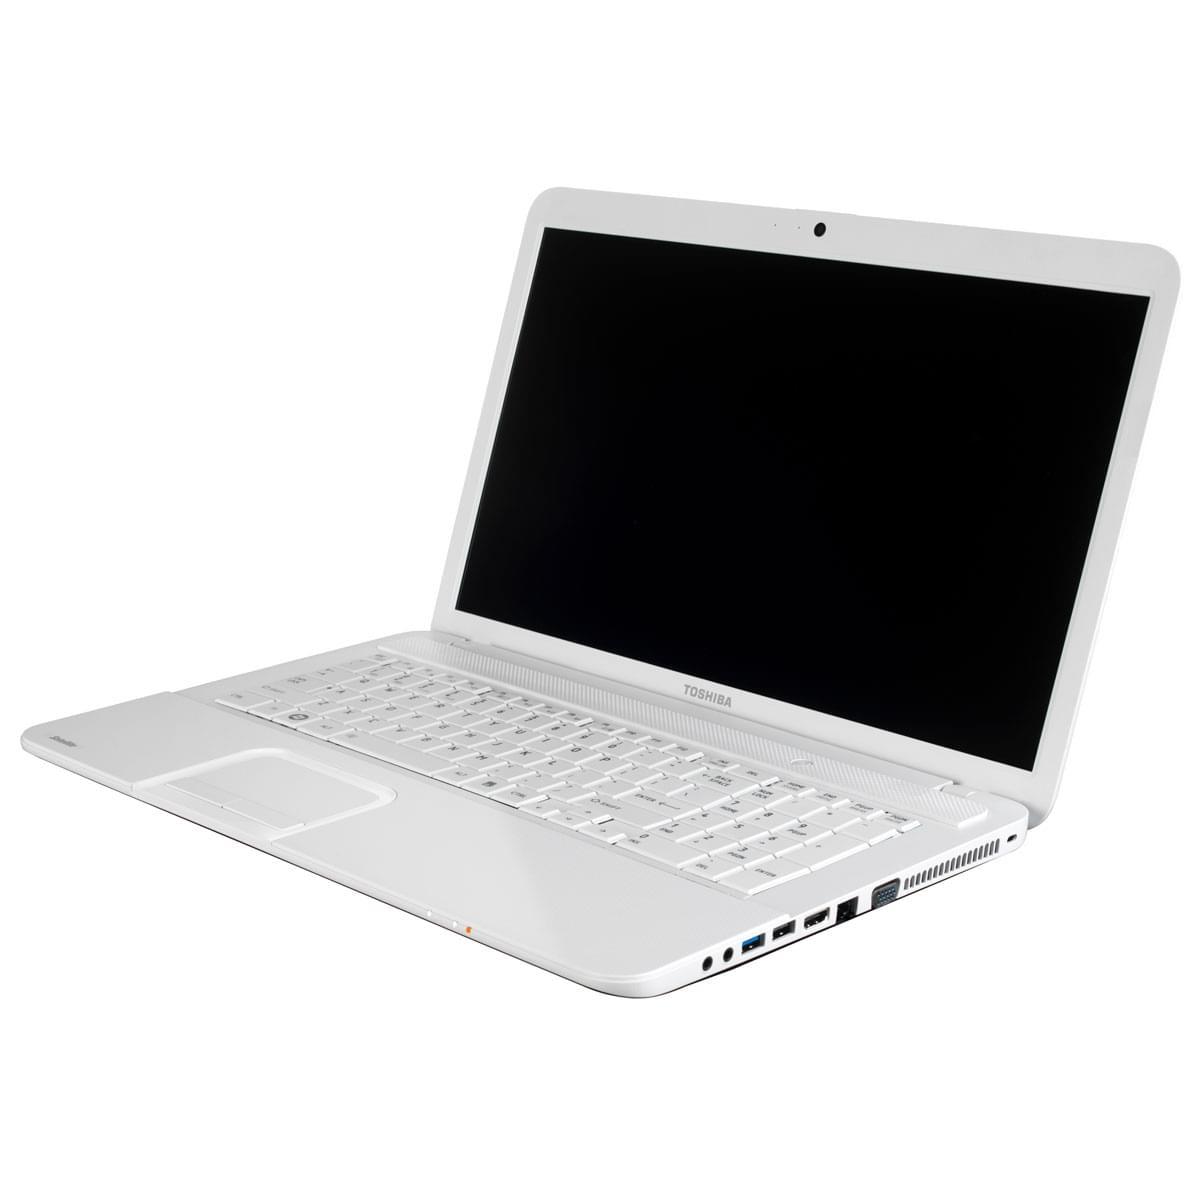 Toshiba C870-15F Blanc (PSC8EE-017006FR) - Achat / Vente PC Portable sur Cybertek.fr - 0